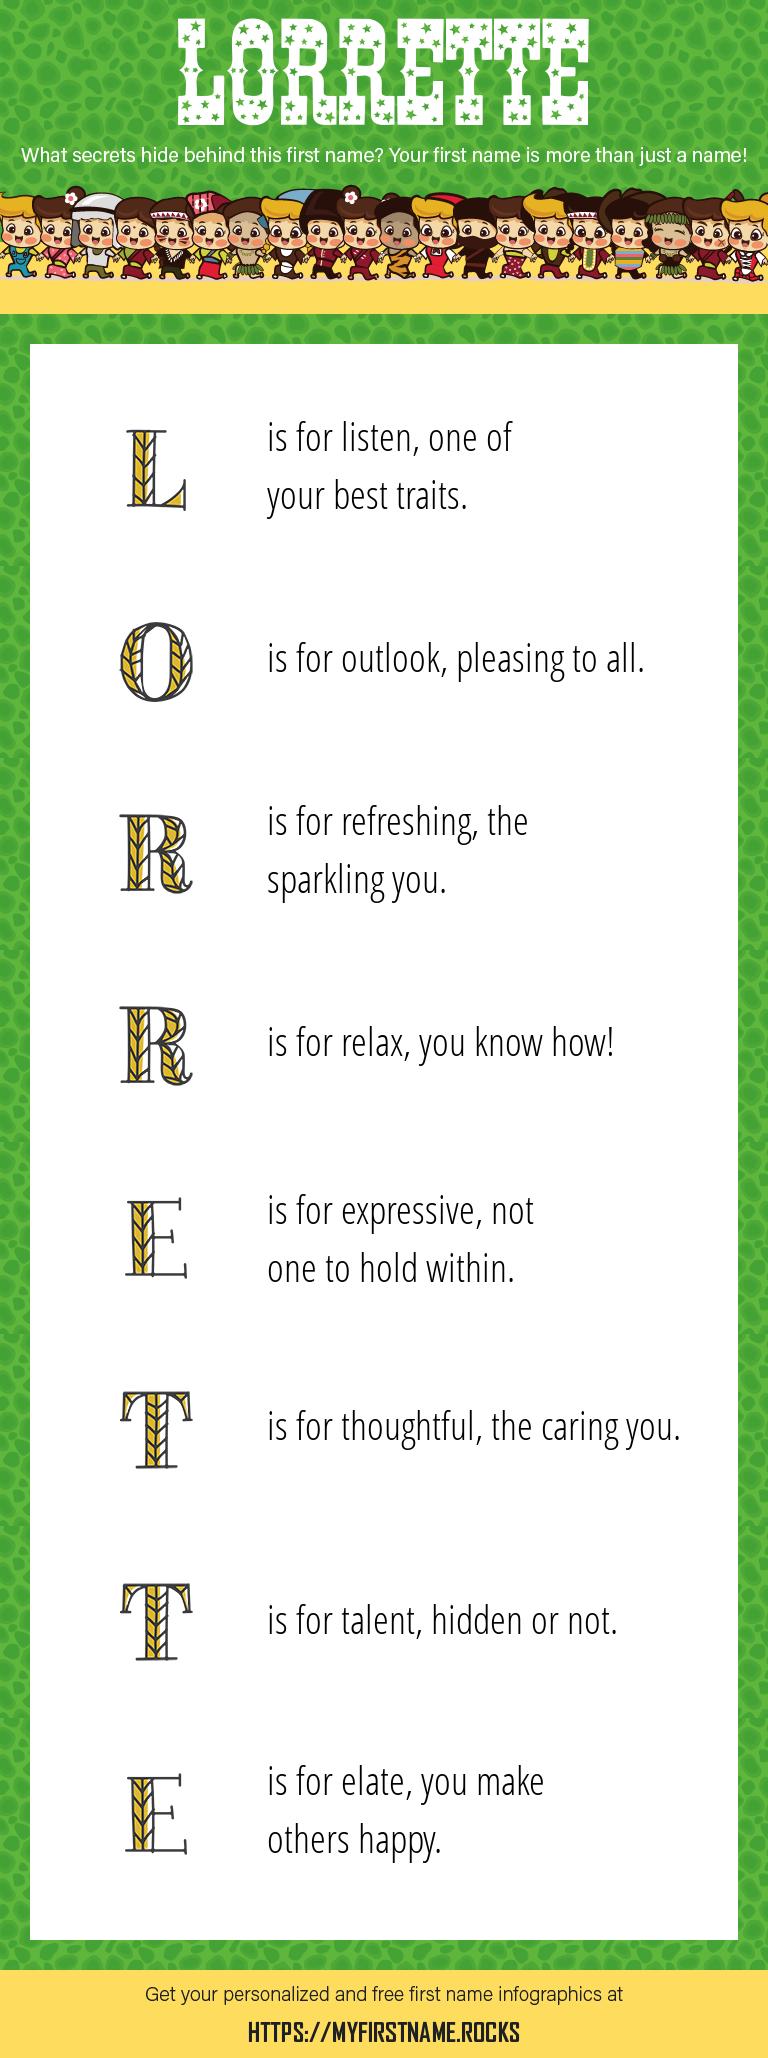 Lorrette Infographics